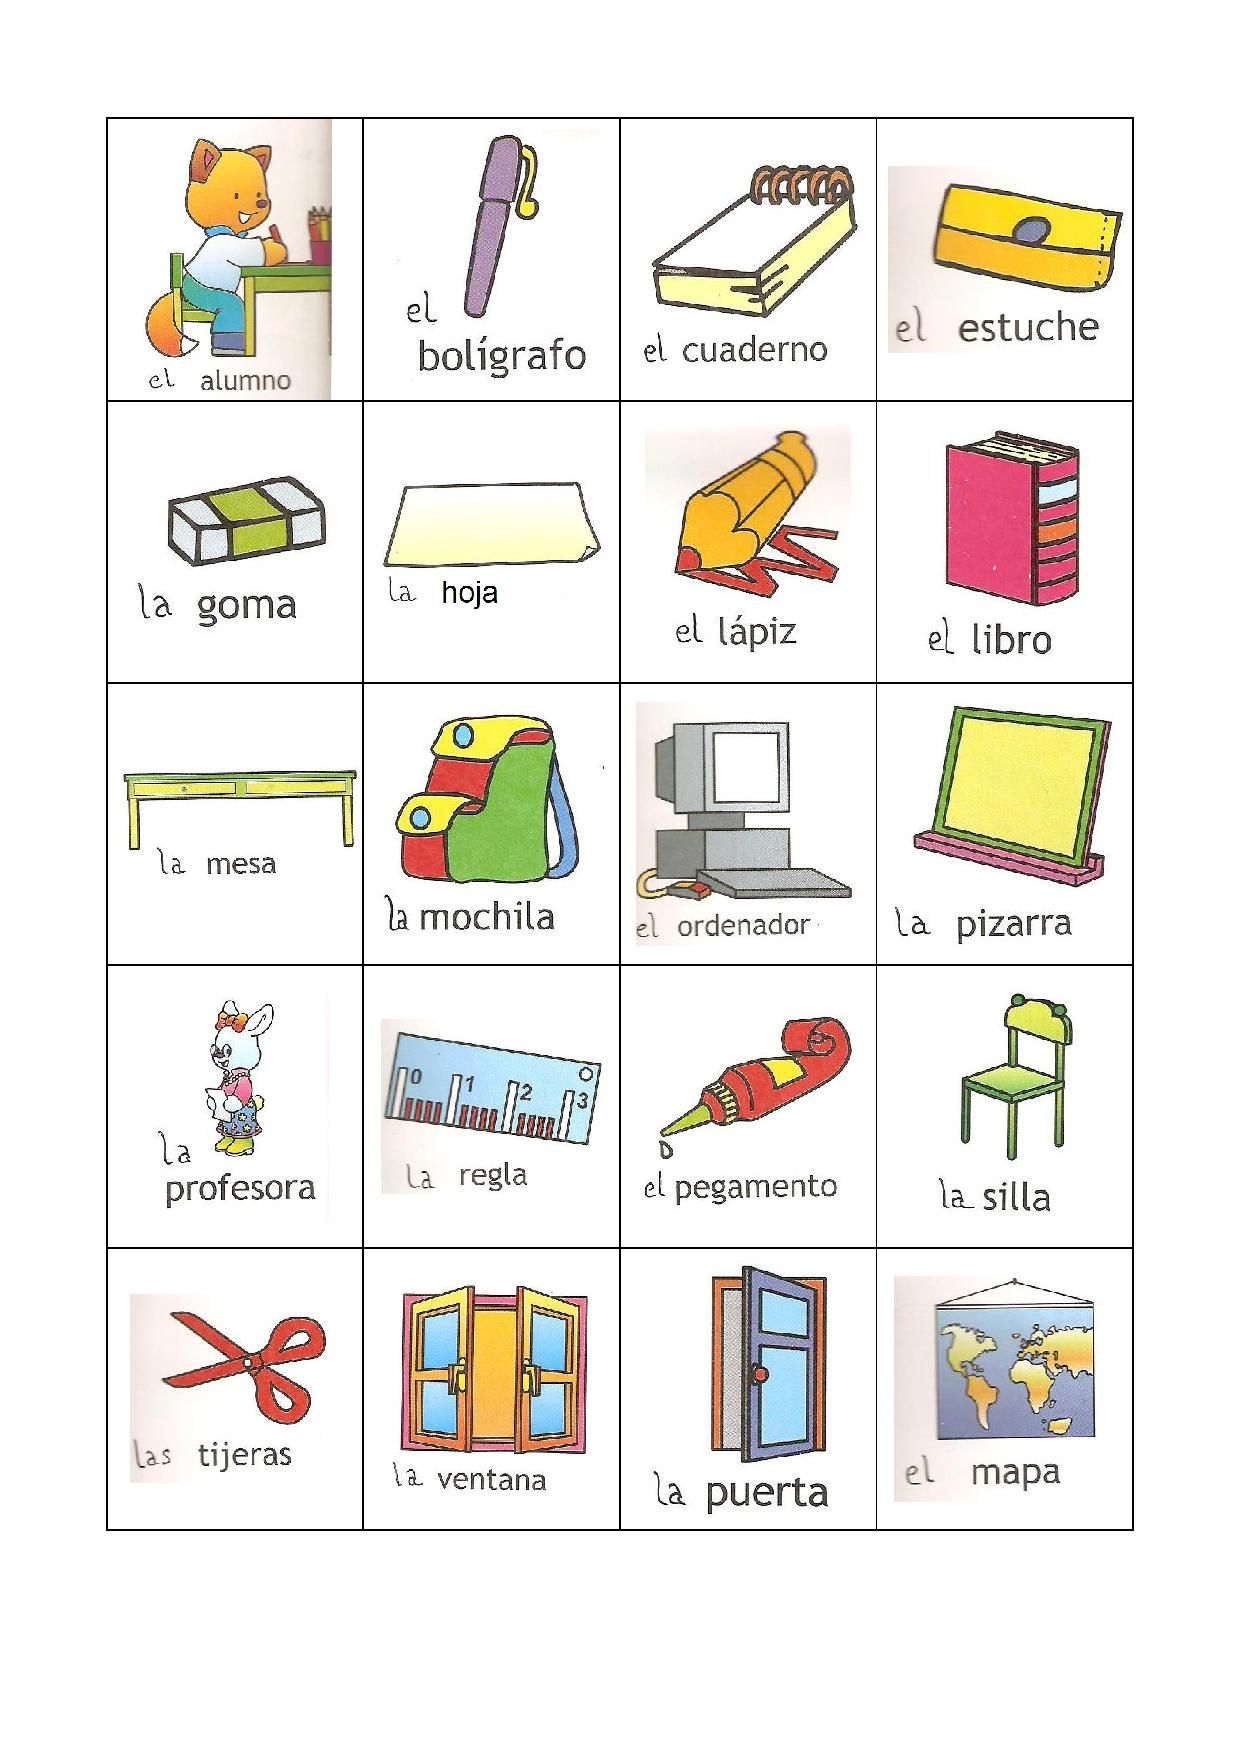 Pictionnary objetos en el aula de clase ficha para for 10 objetos en ingles del salon de clases